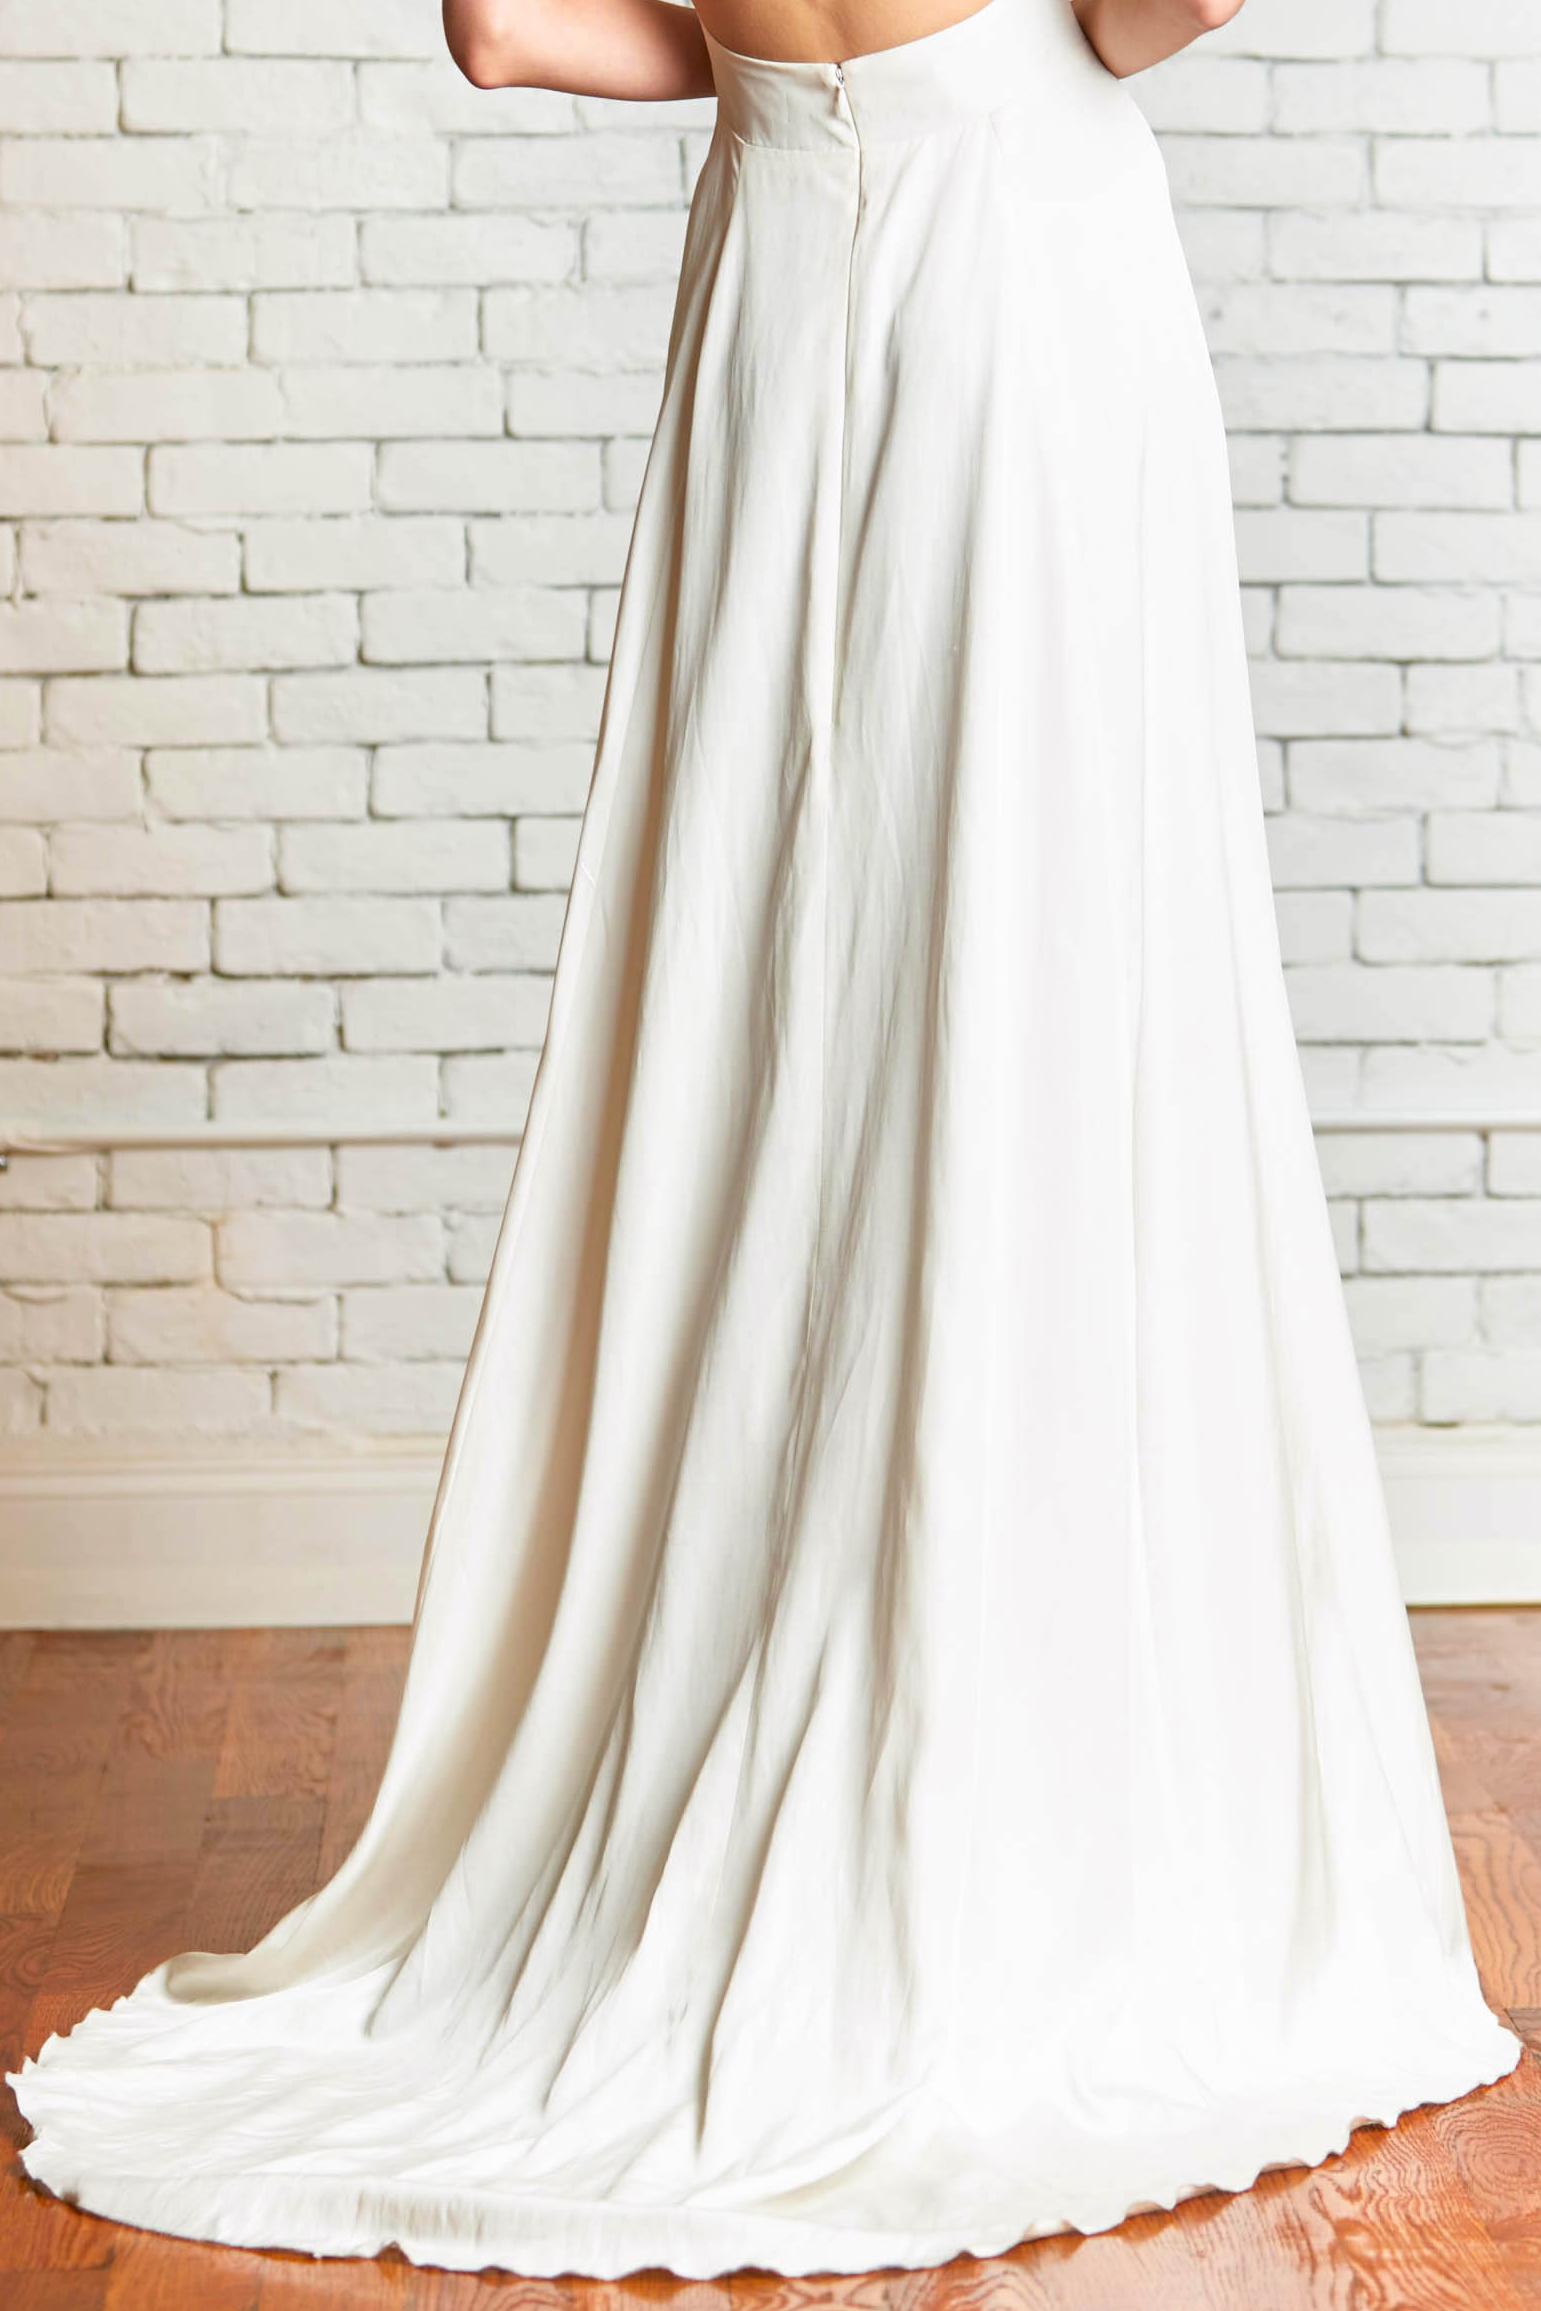 Lincoln_2back-A-line_Skirt_Dramatic_Modern_Wedding_Skirts.jpg